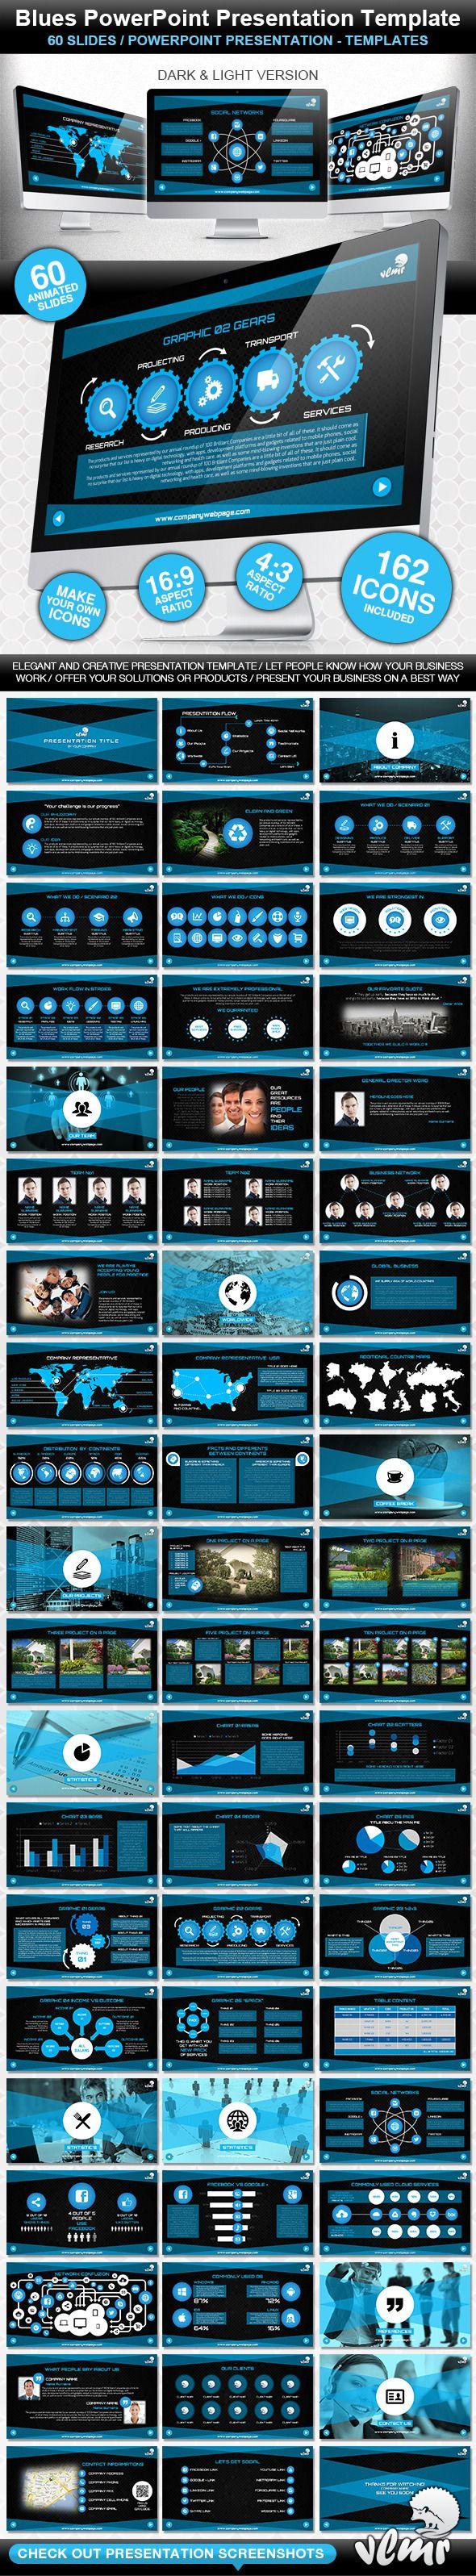 Blues PowerPoint Presentation Template - Creative PowerPoint Templates